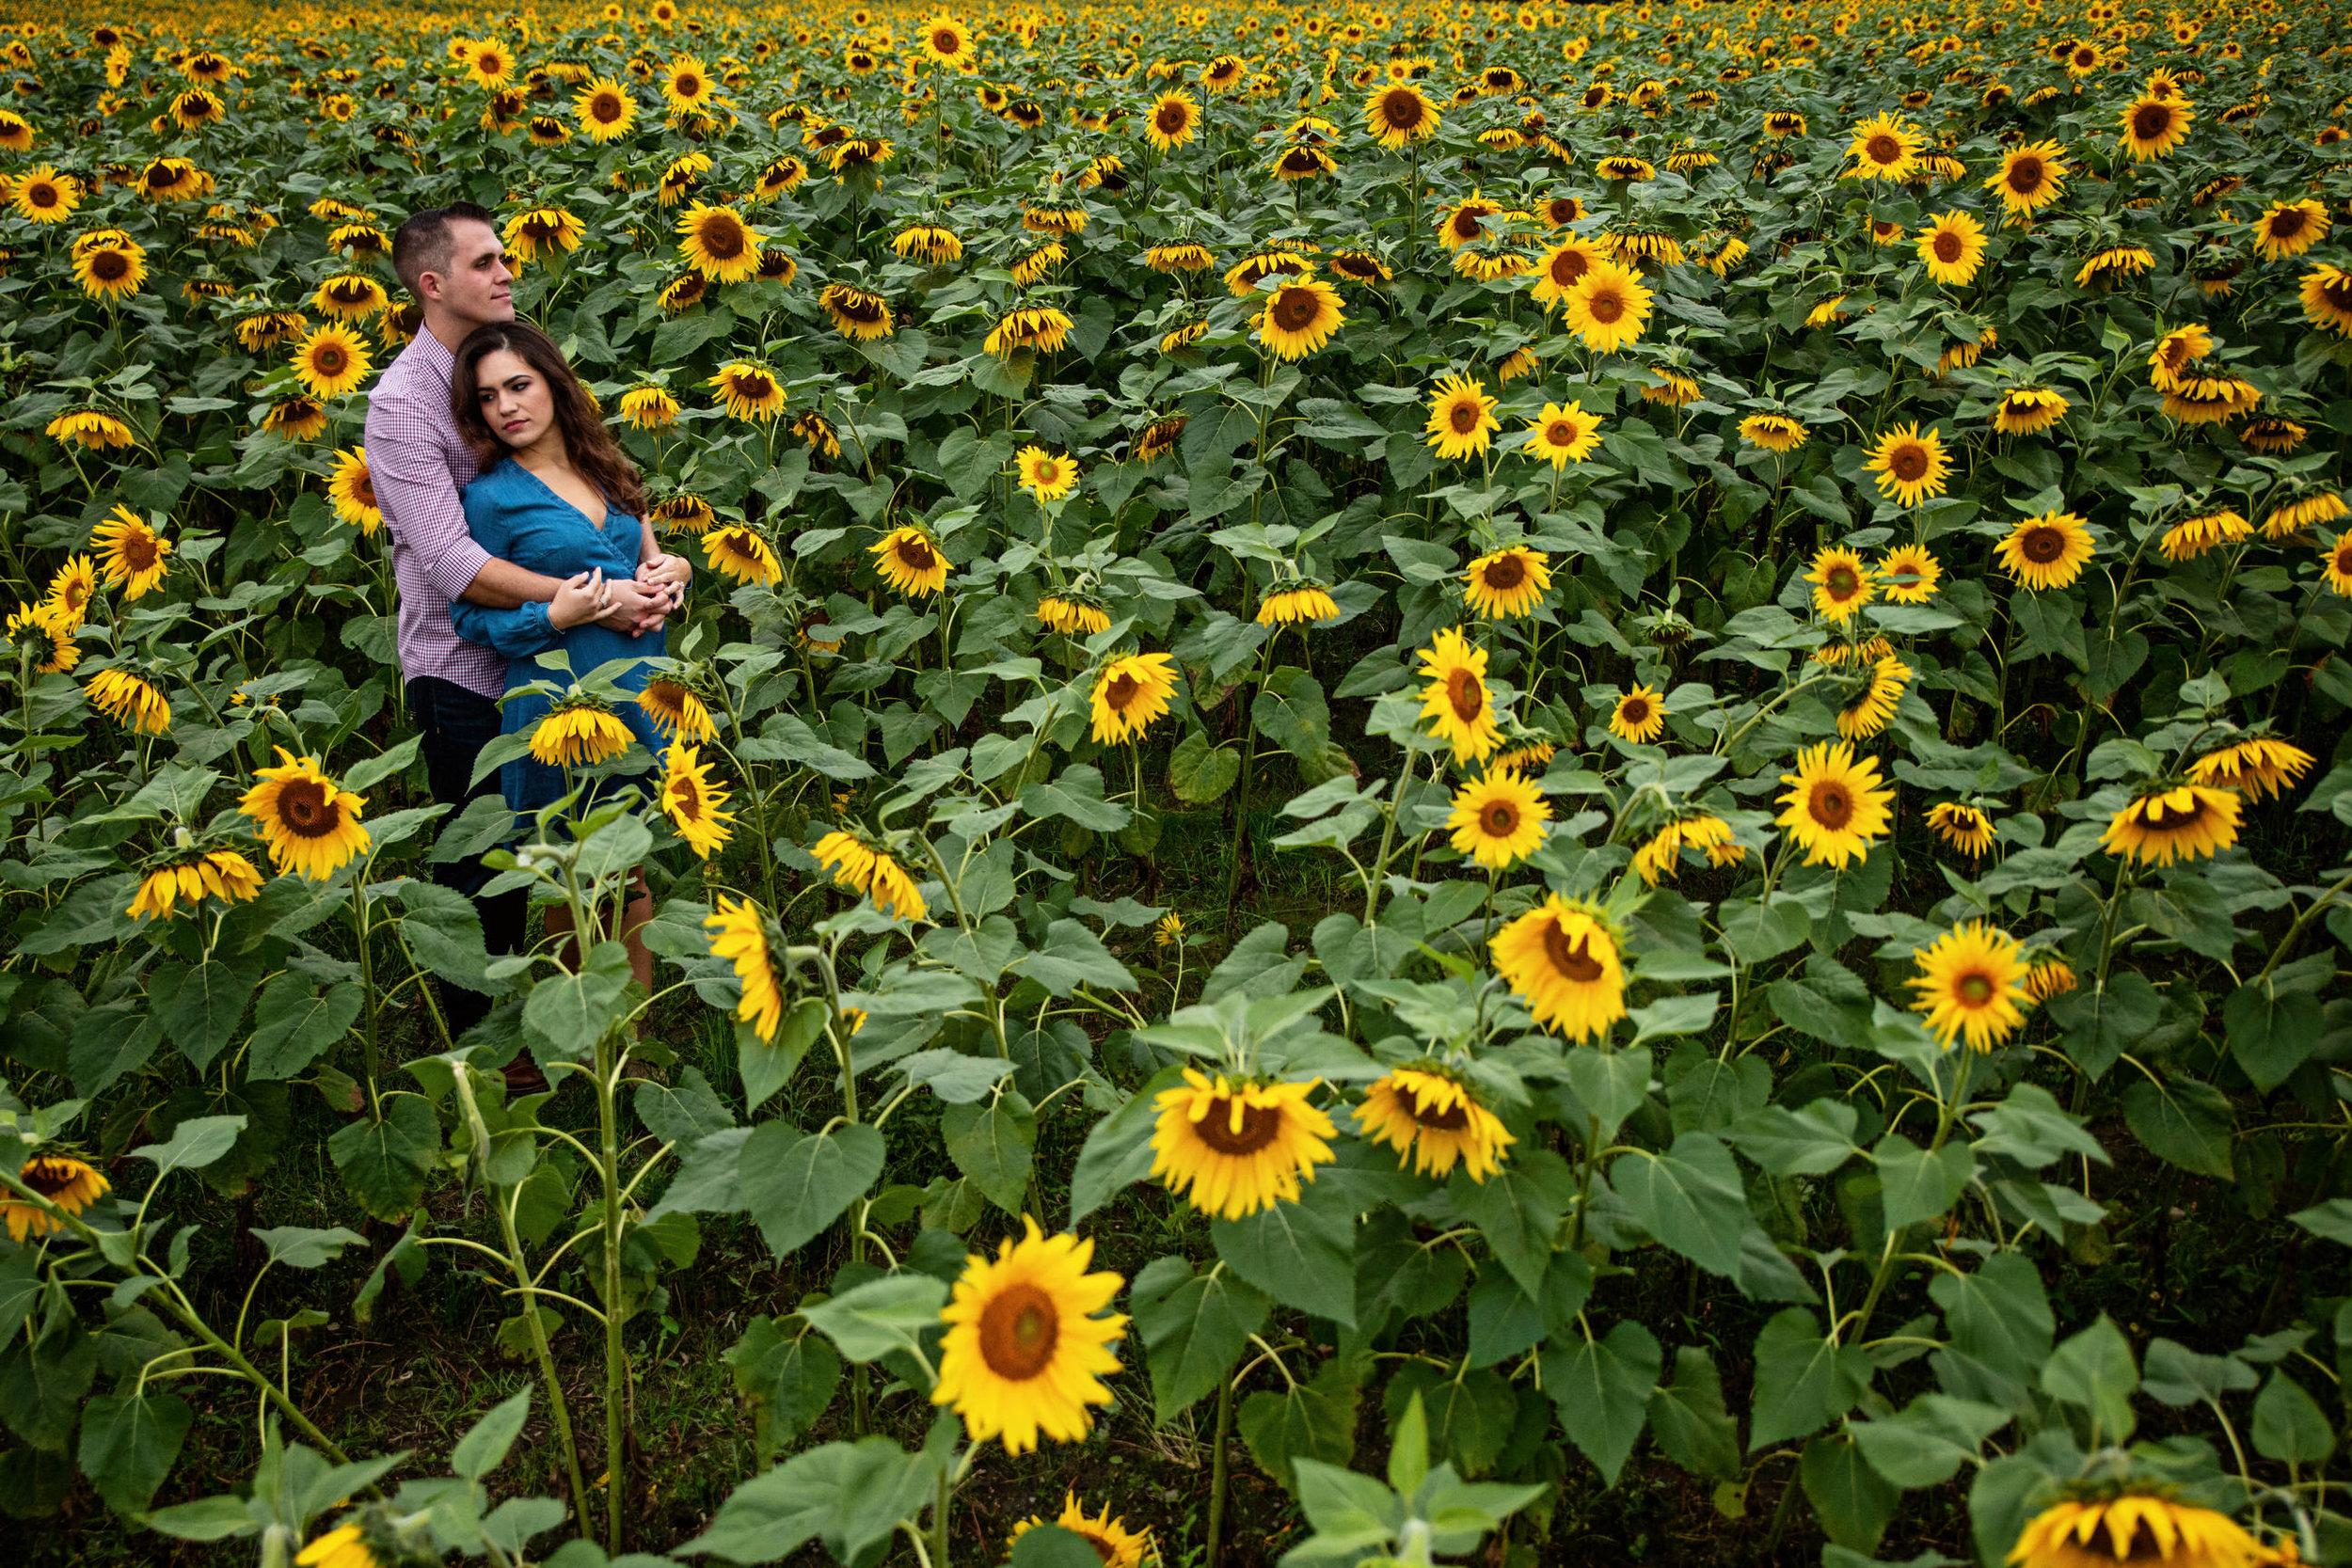 MarylandAdventureEngagement-Brenda&Tony-62.jpg